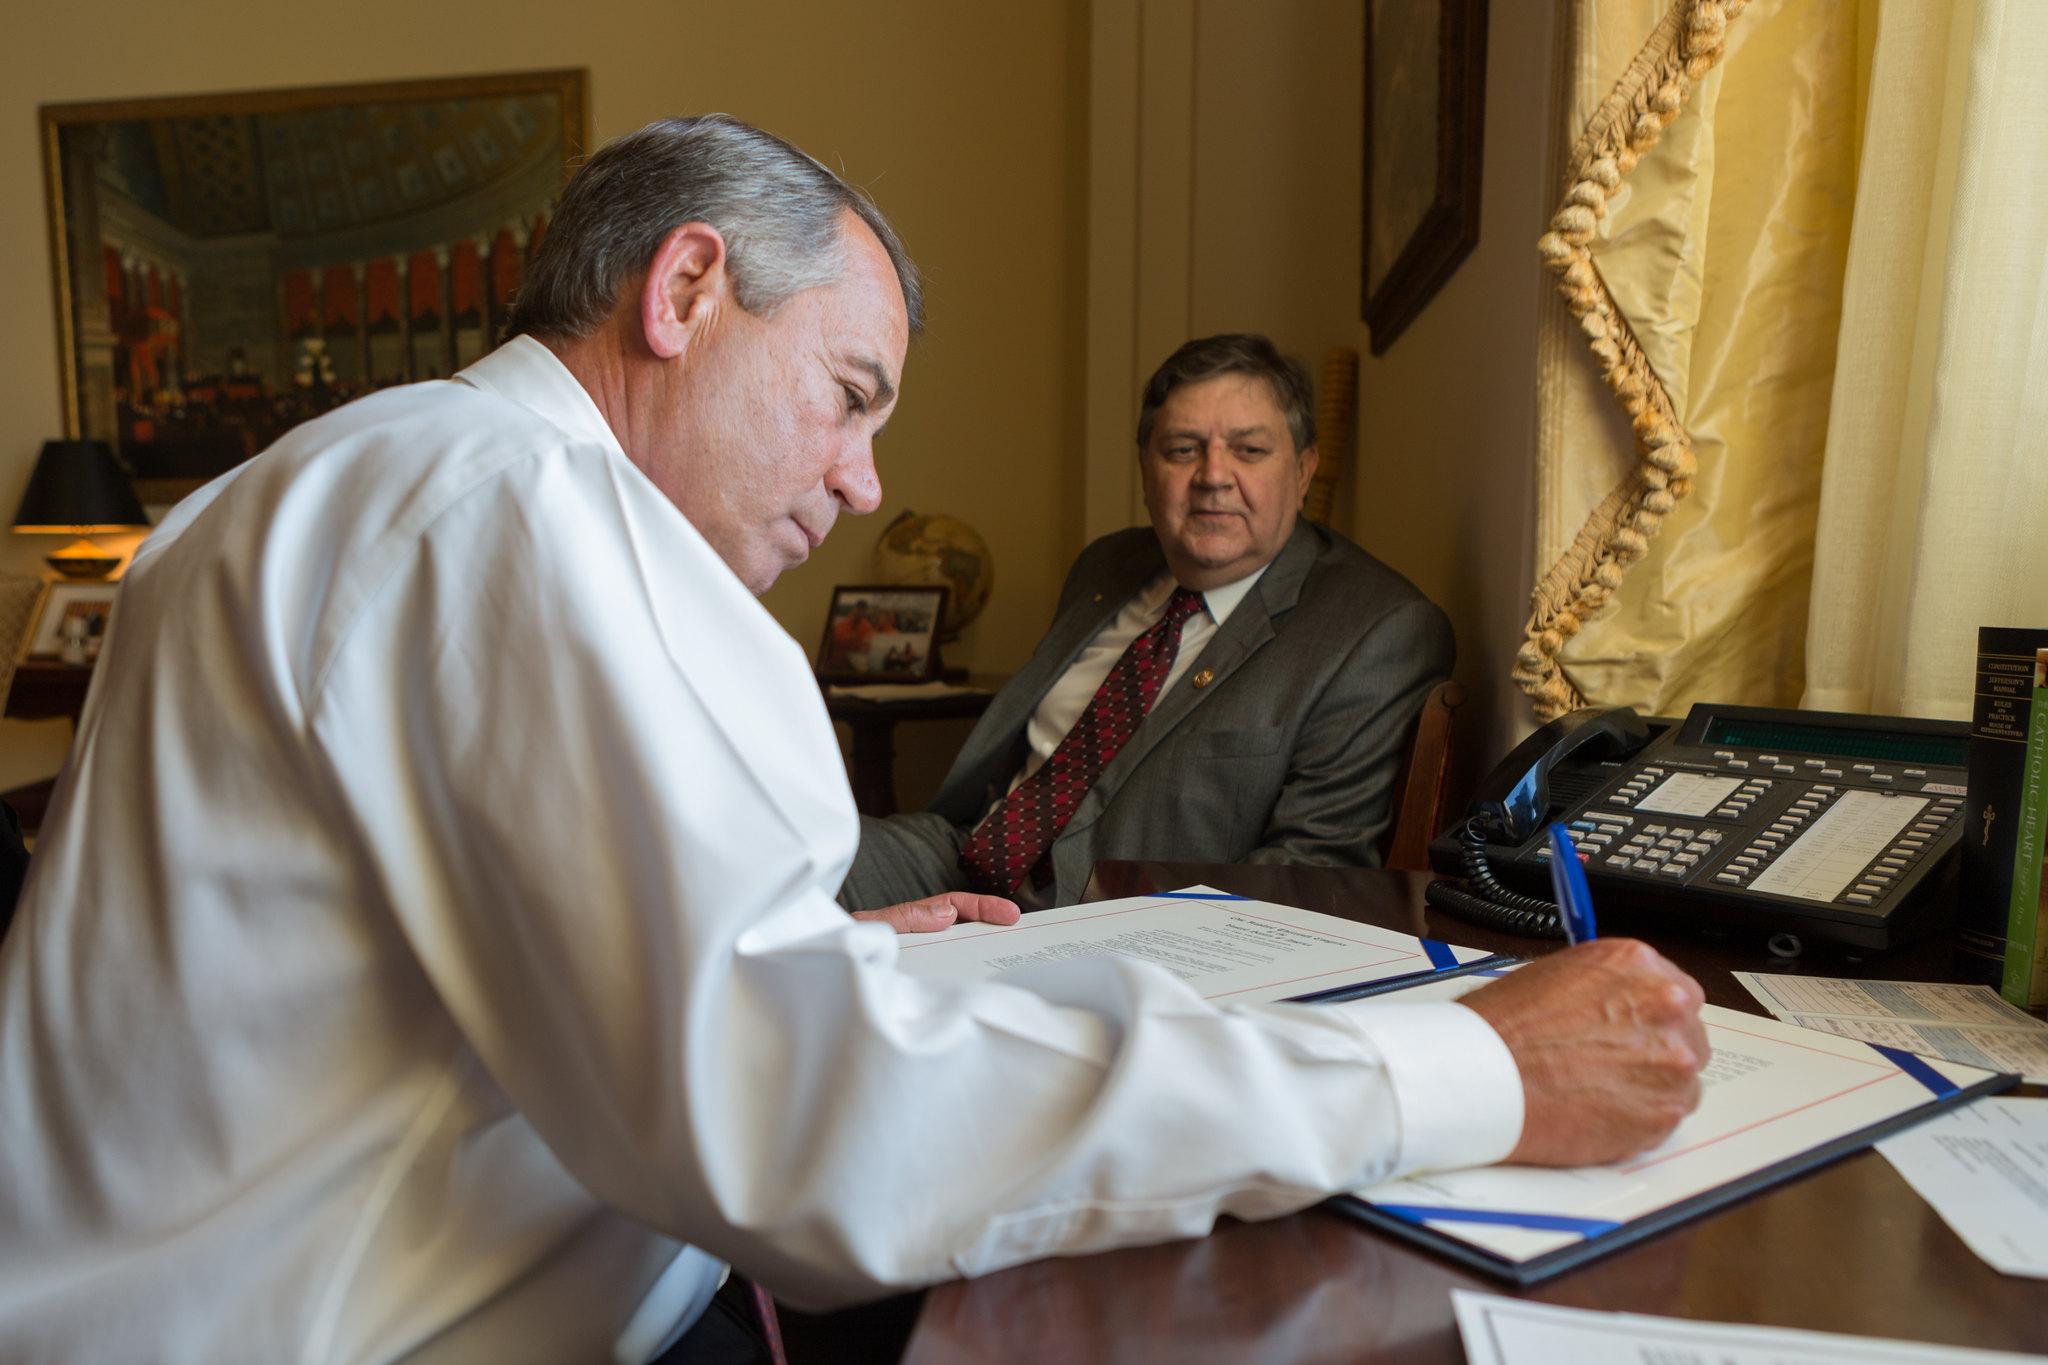 Speaker John Boehner signs the Sleeping Bear Dunes National Lakeshore Conservation and Recreation Act as Rep. Dan Benishek (R-MI), the sponsor of the House version of the legislation, looks on.